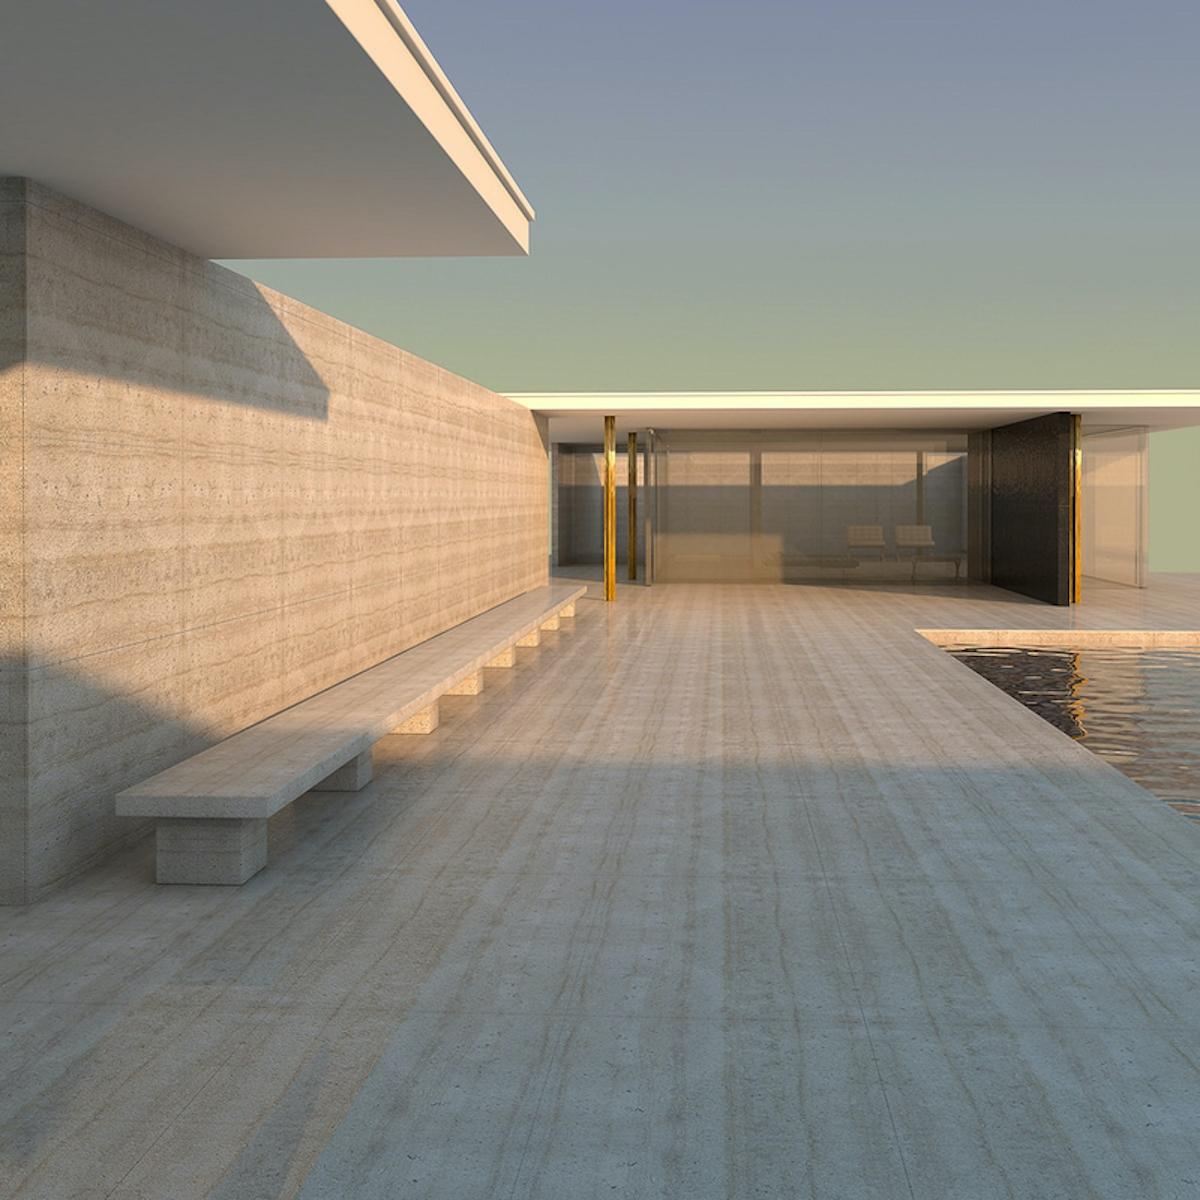 Barcelona pavillon allemand architecture Ludwig Mies van der Rohe - blog déco - clemaroundthecorner